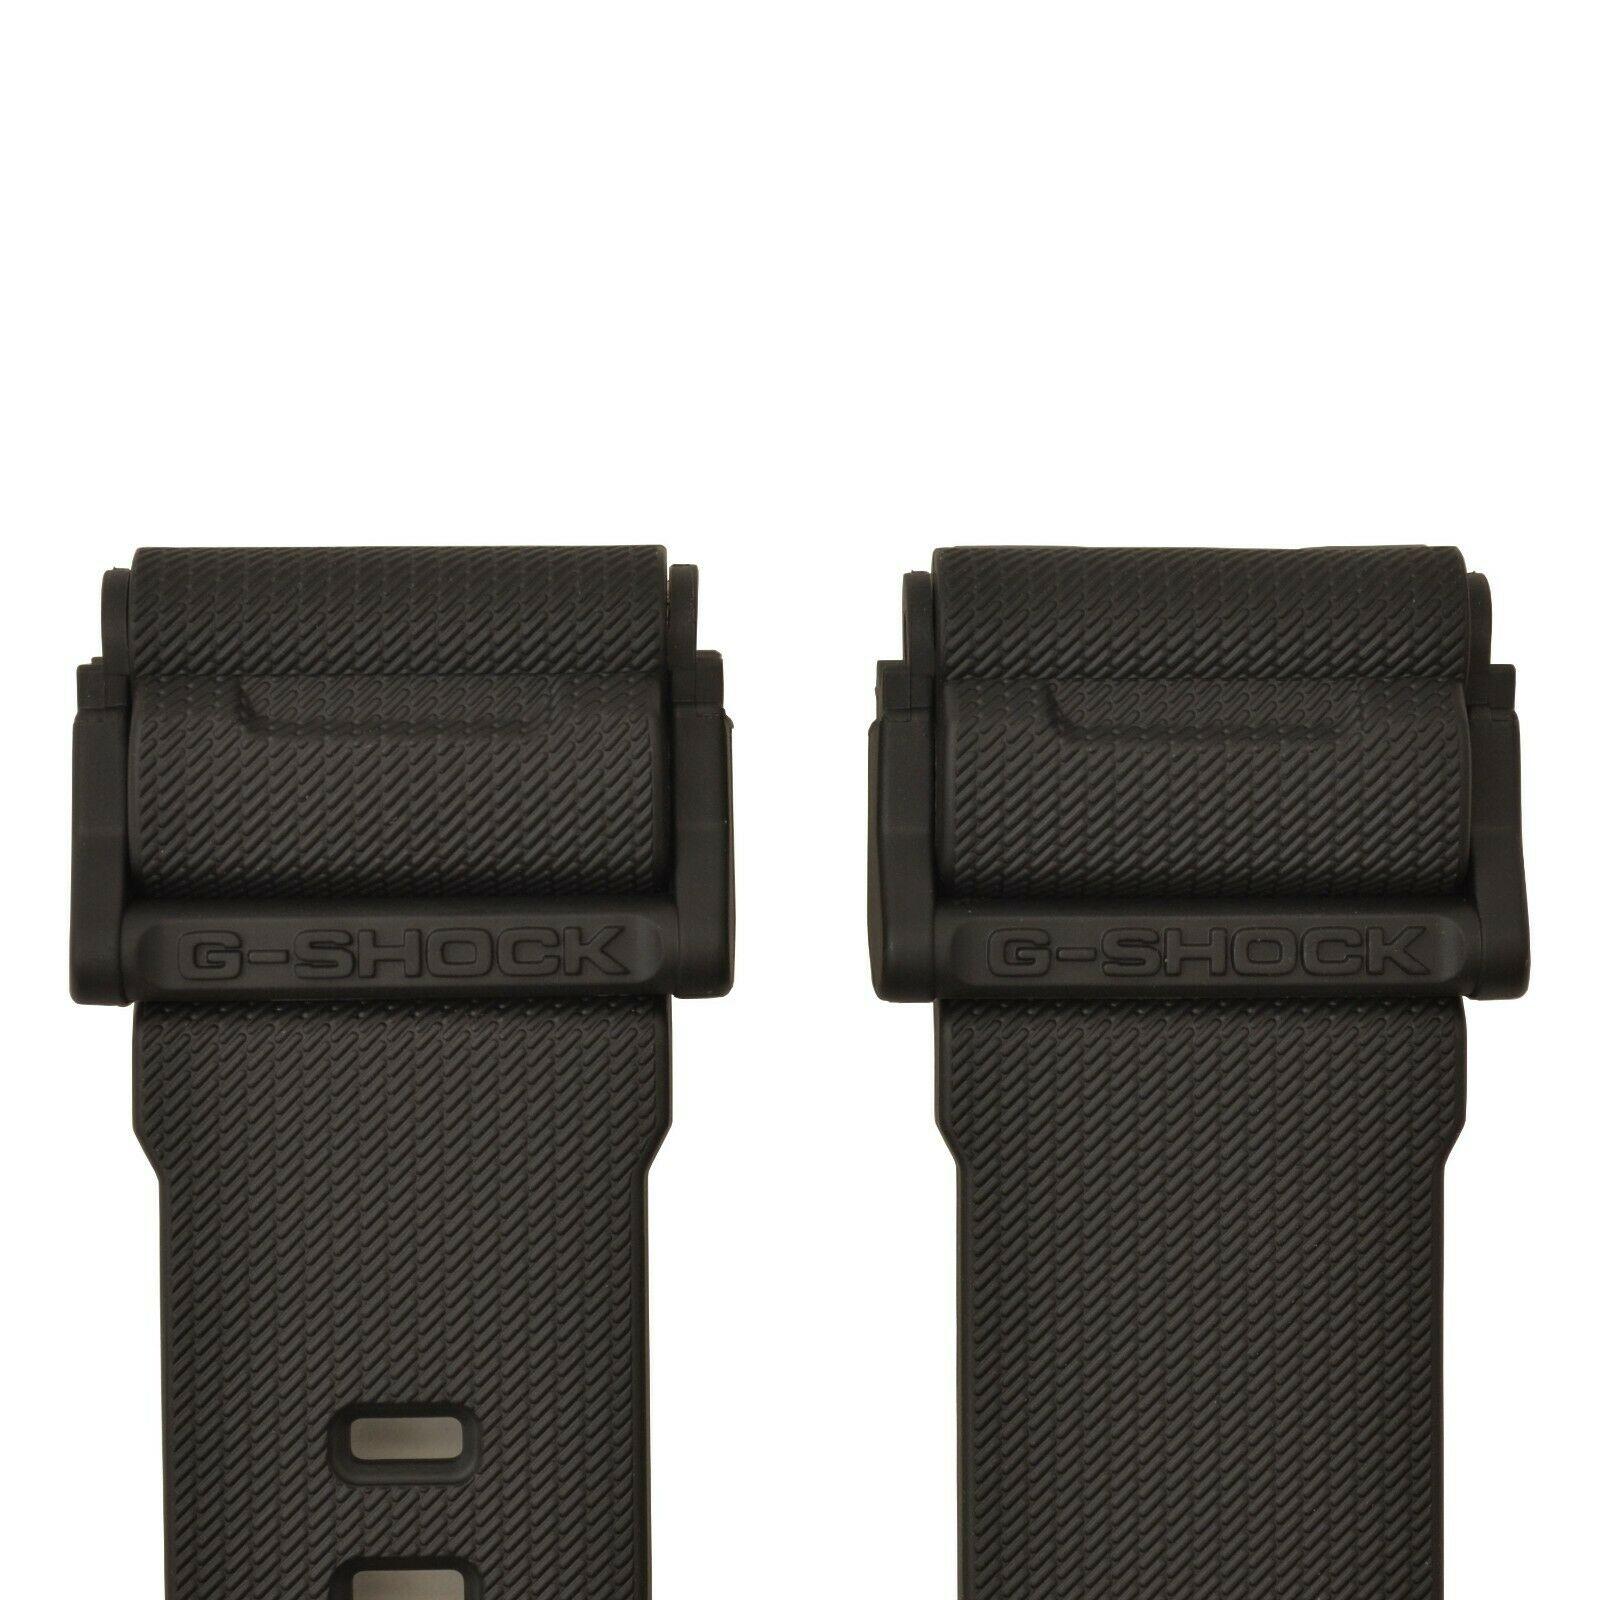 Pulseira + Bezel Casio G-Shock GD-400MB-1 Preto Fosco  - E-Presentes